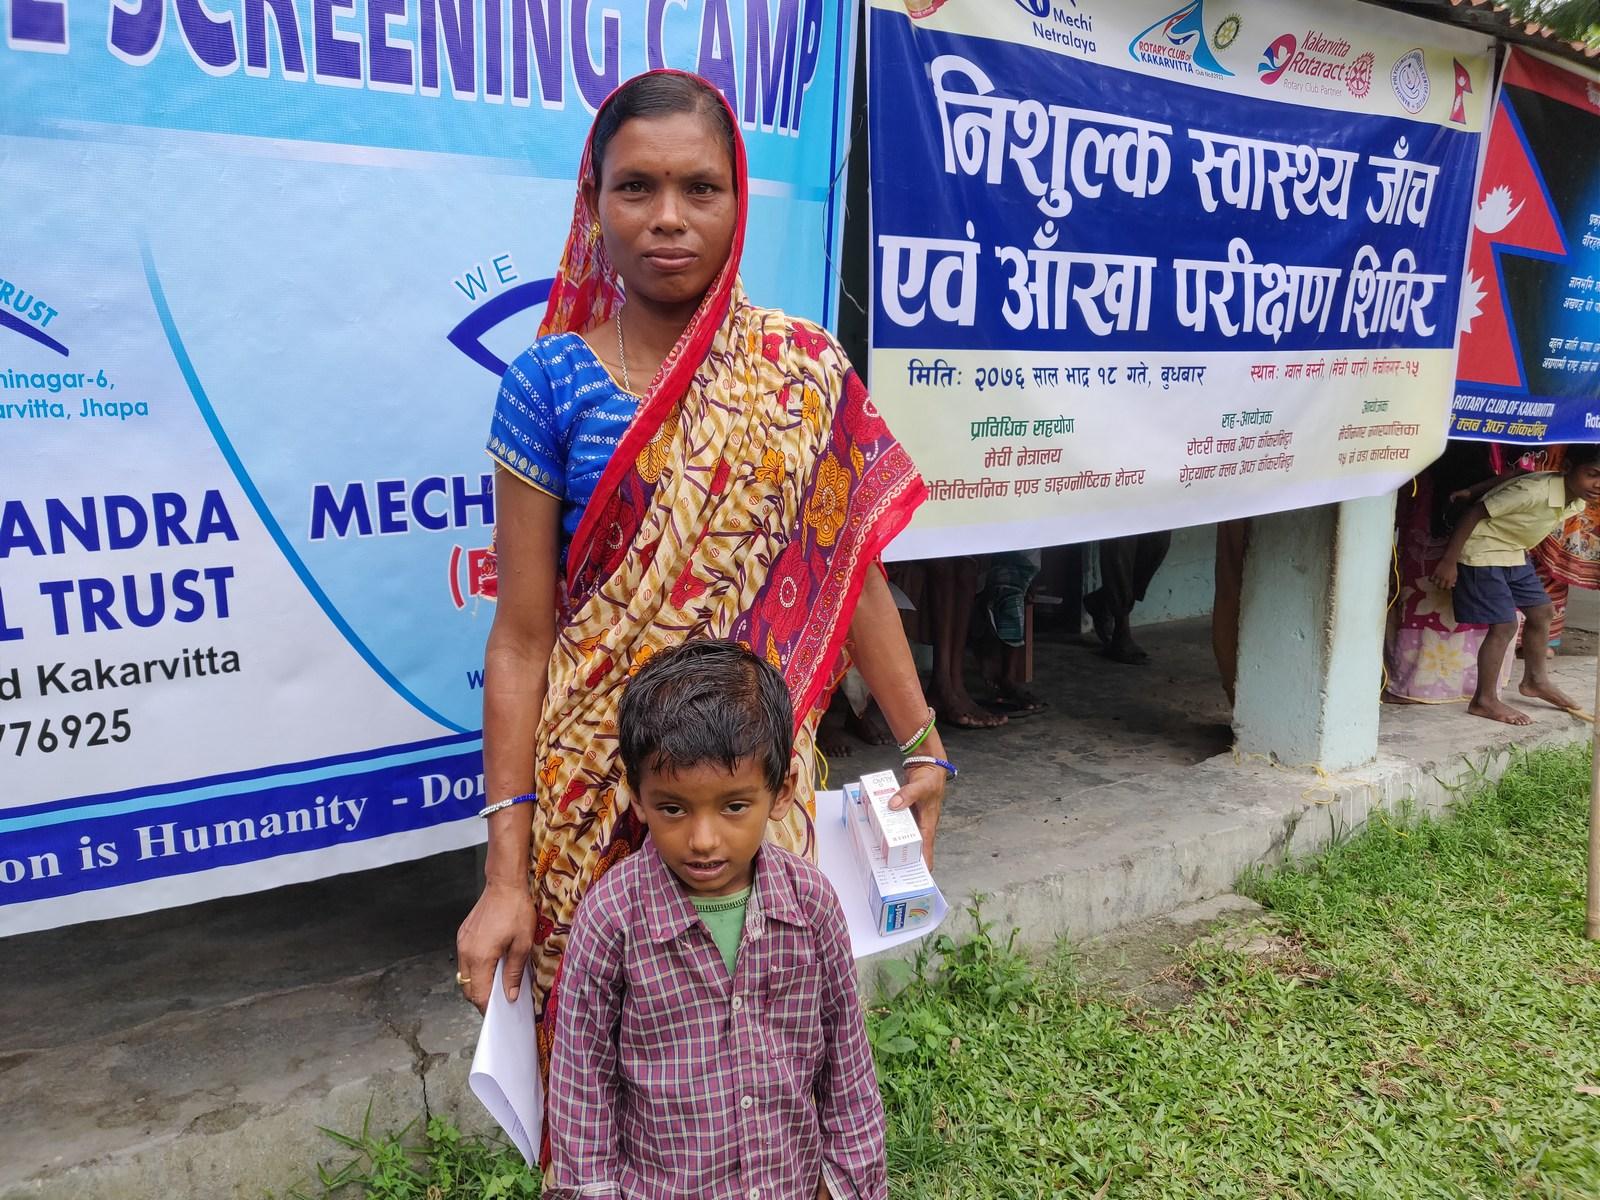 Free-Health-Camp-Eye-Screening-at-Gwala-Basti-Mechinagar-15-Jhapa-Nepal-Rotary-Club-of-Kakarvitta-24